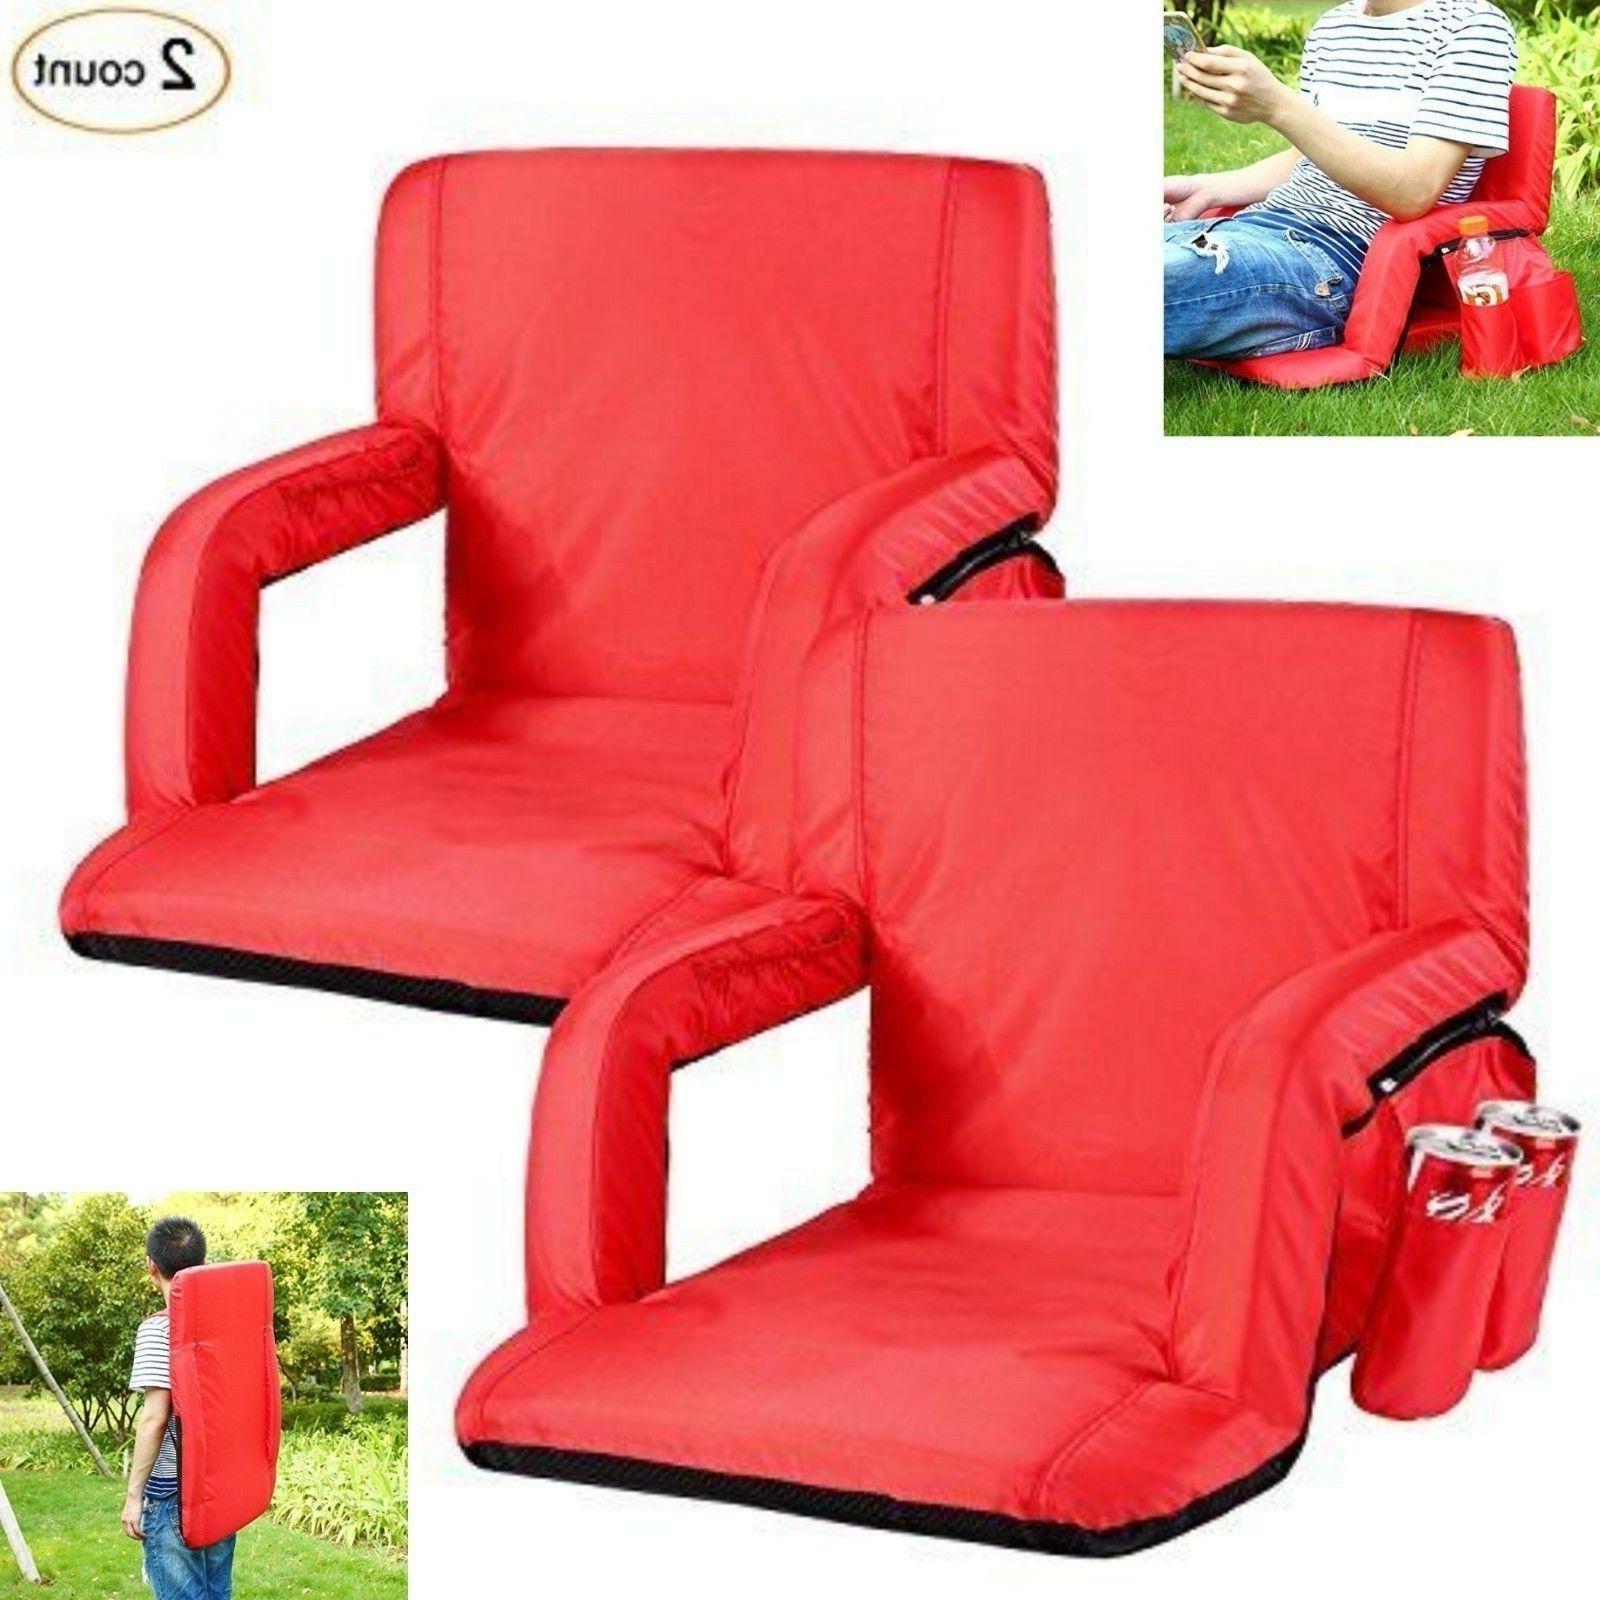 portable seats chairs reclining backs padded cushion